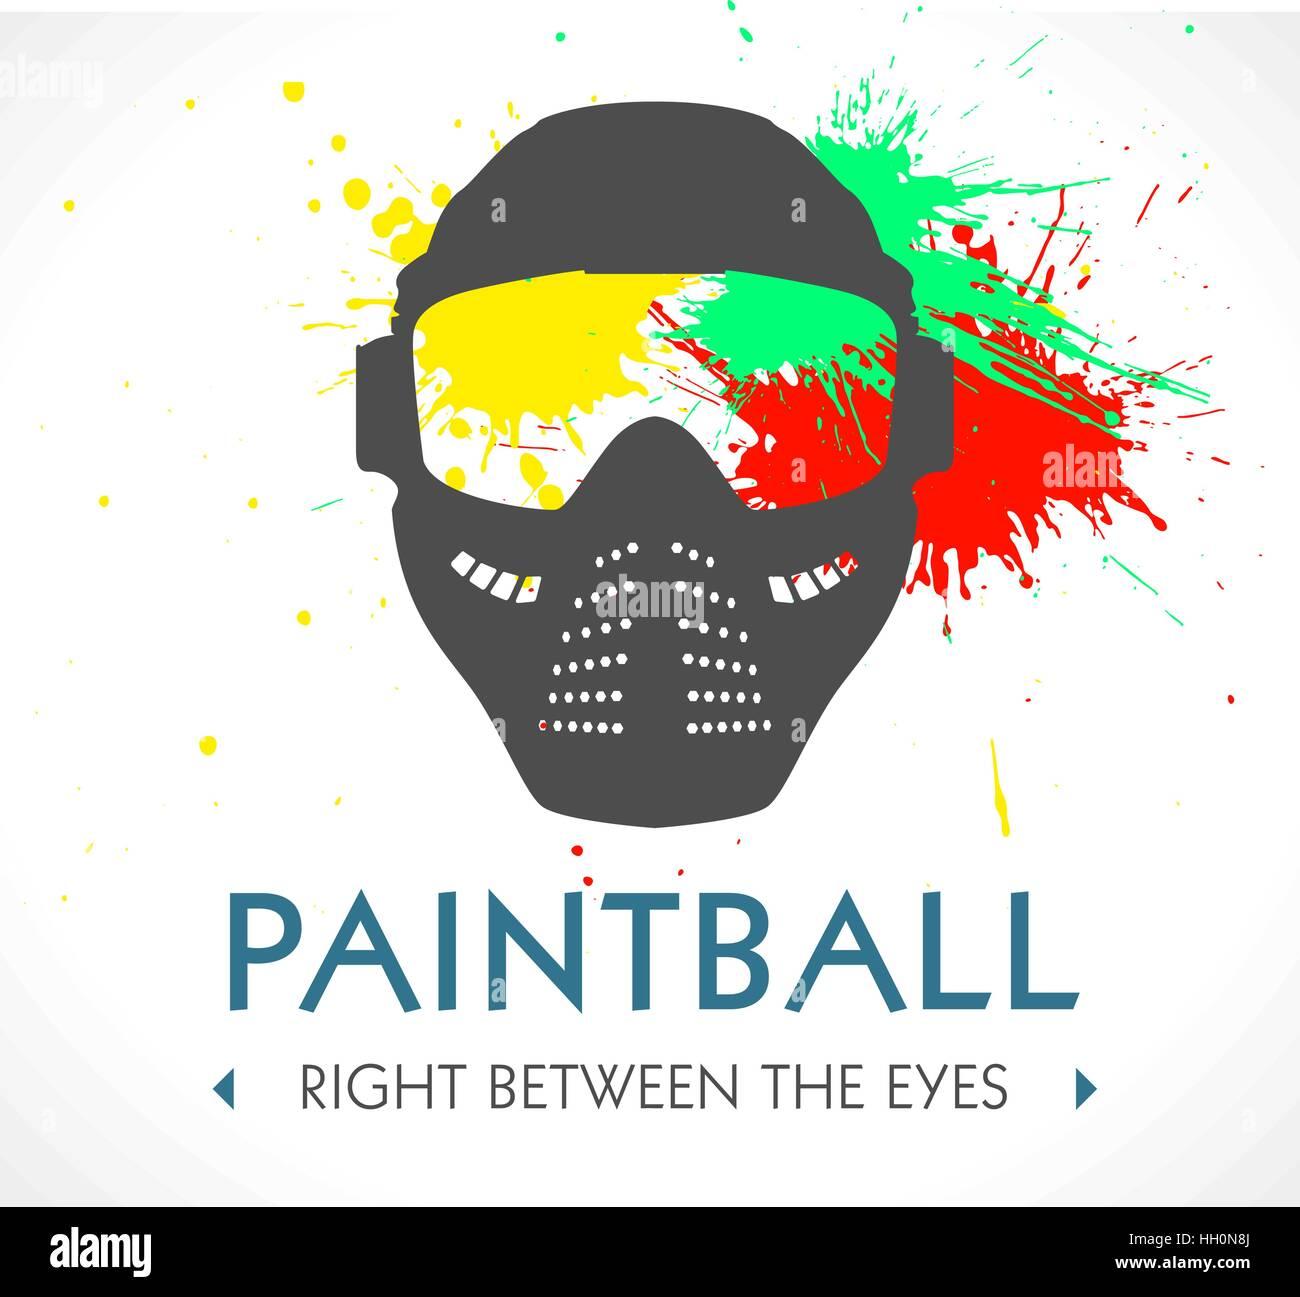 paintball logo stock vector art illustration vector image rh alamy com paintball bogota sur paintball bogota sur